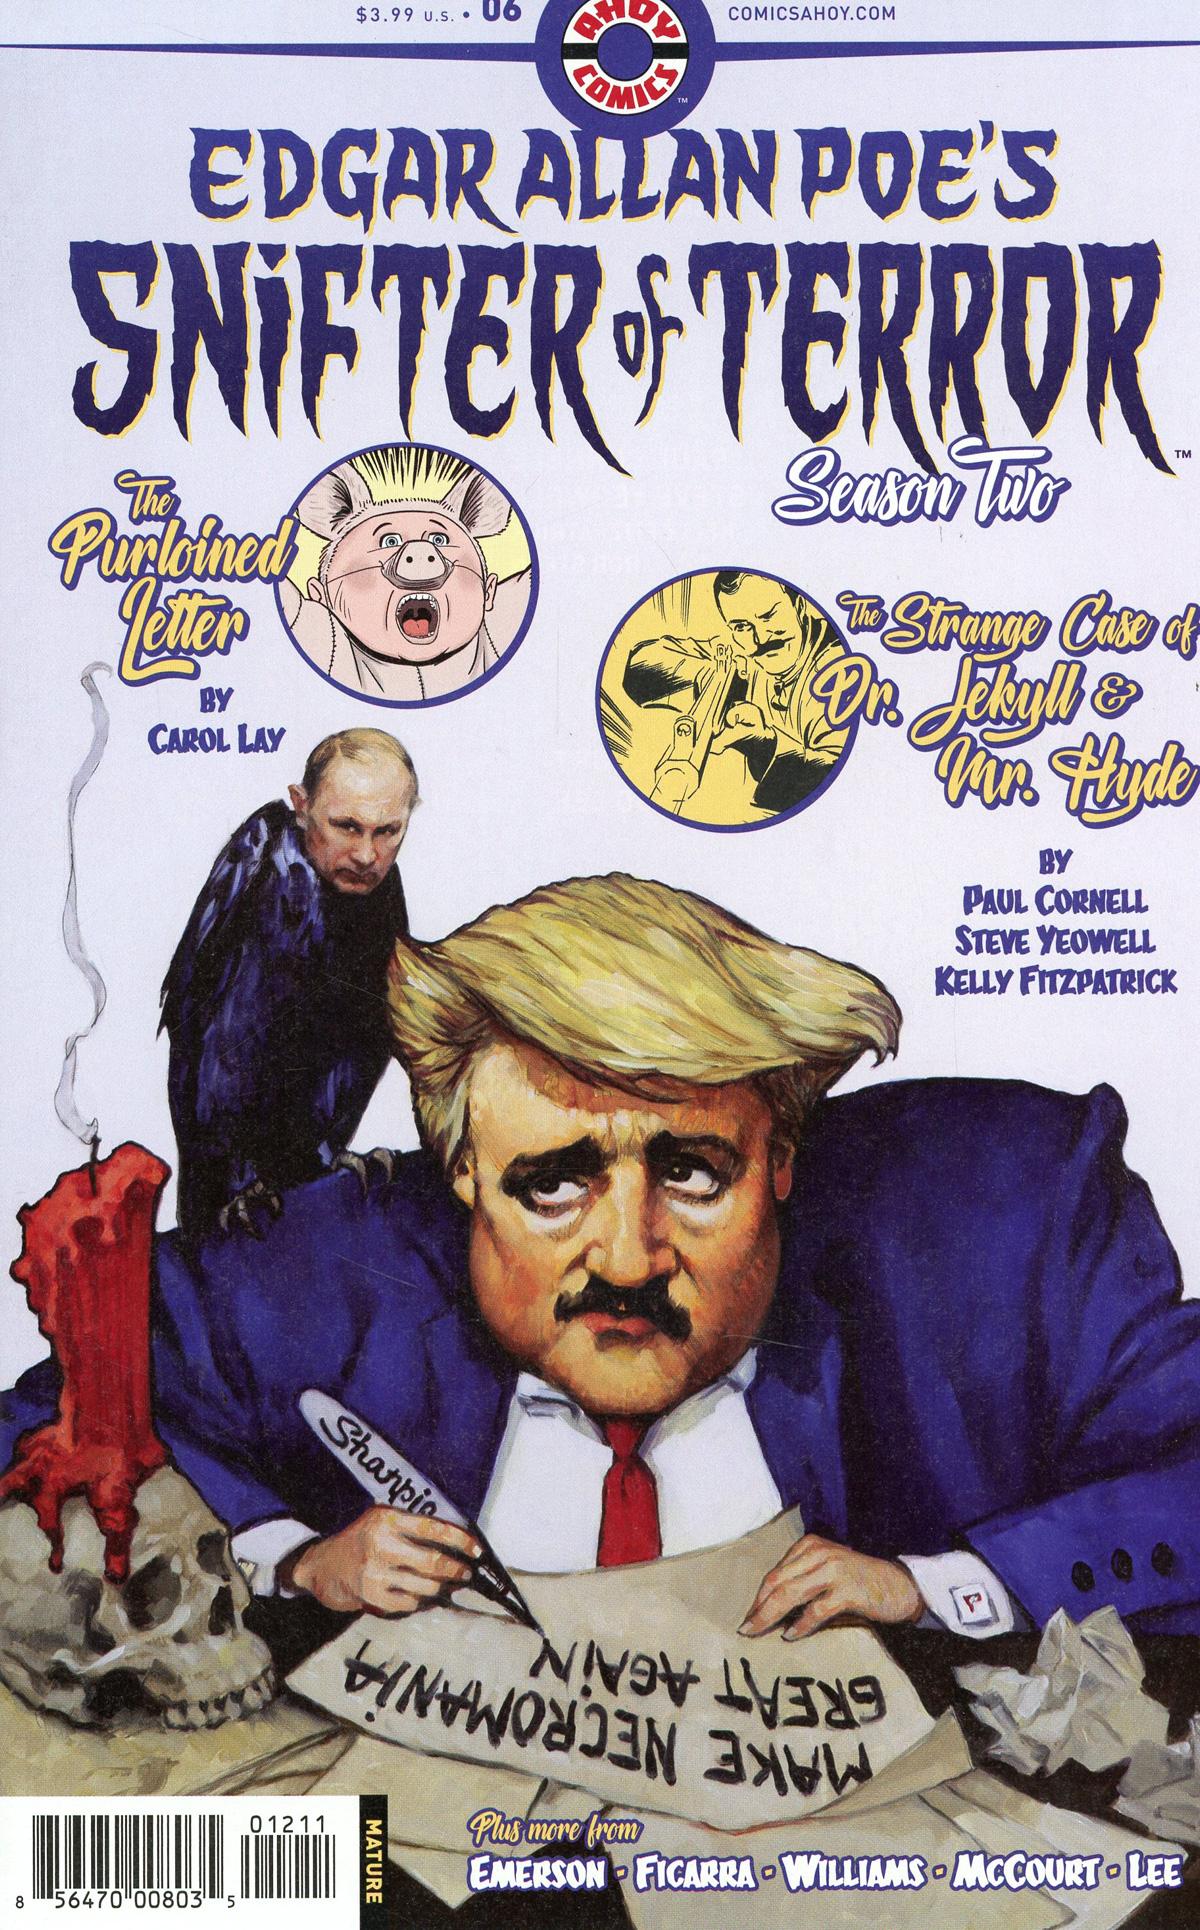 Edgar Allan Poes Snifter Of Terror Season 2 #6